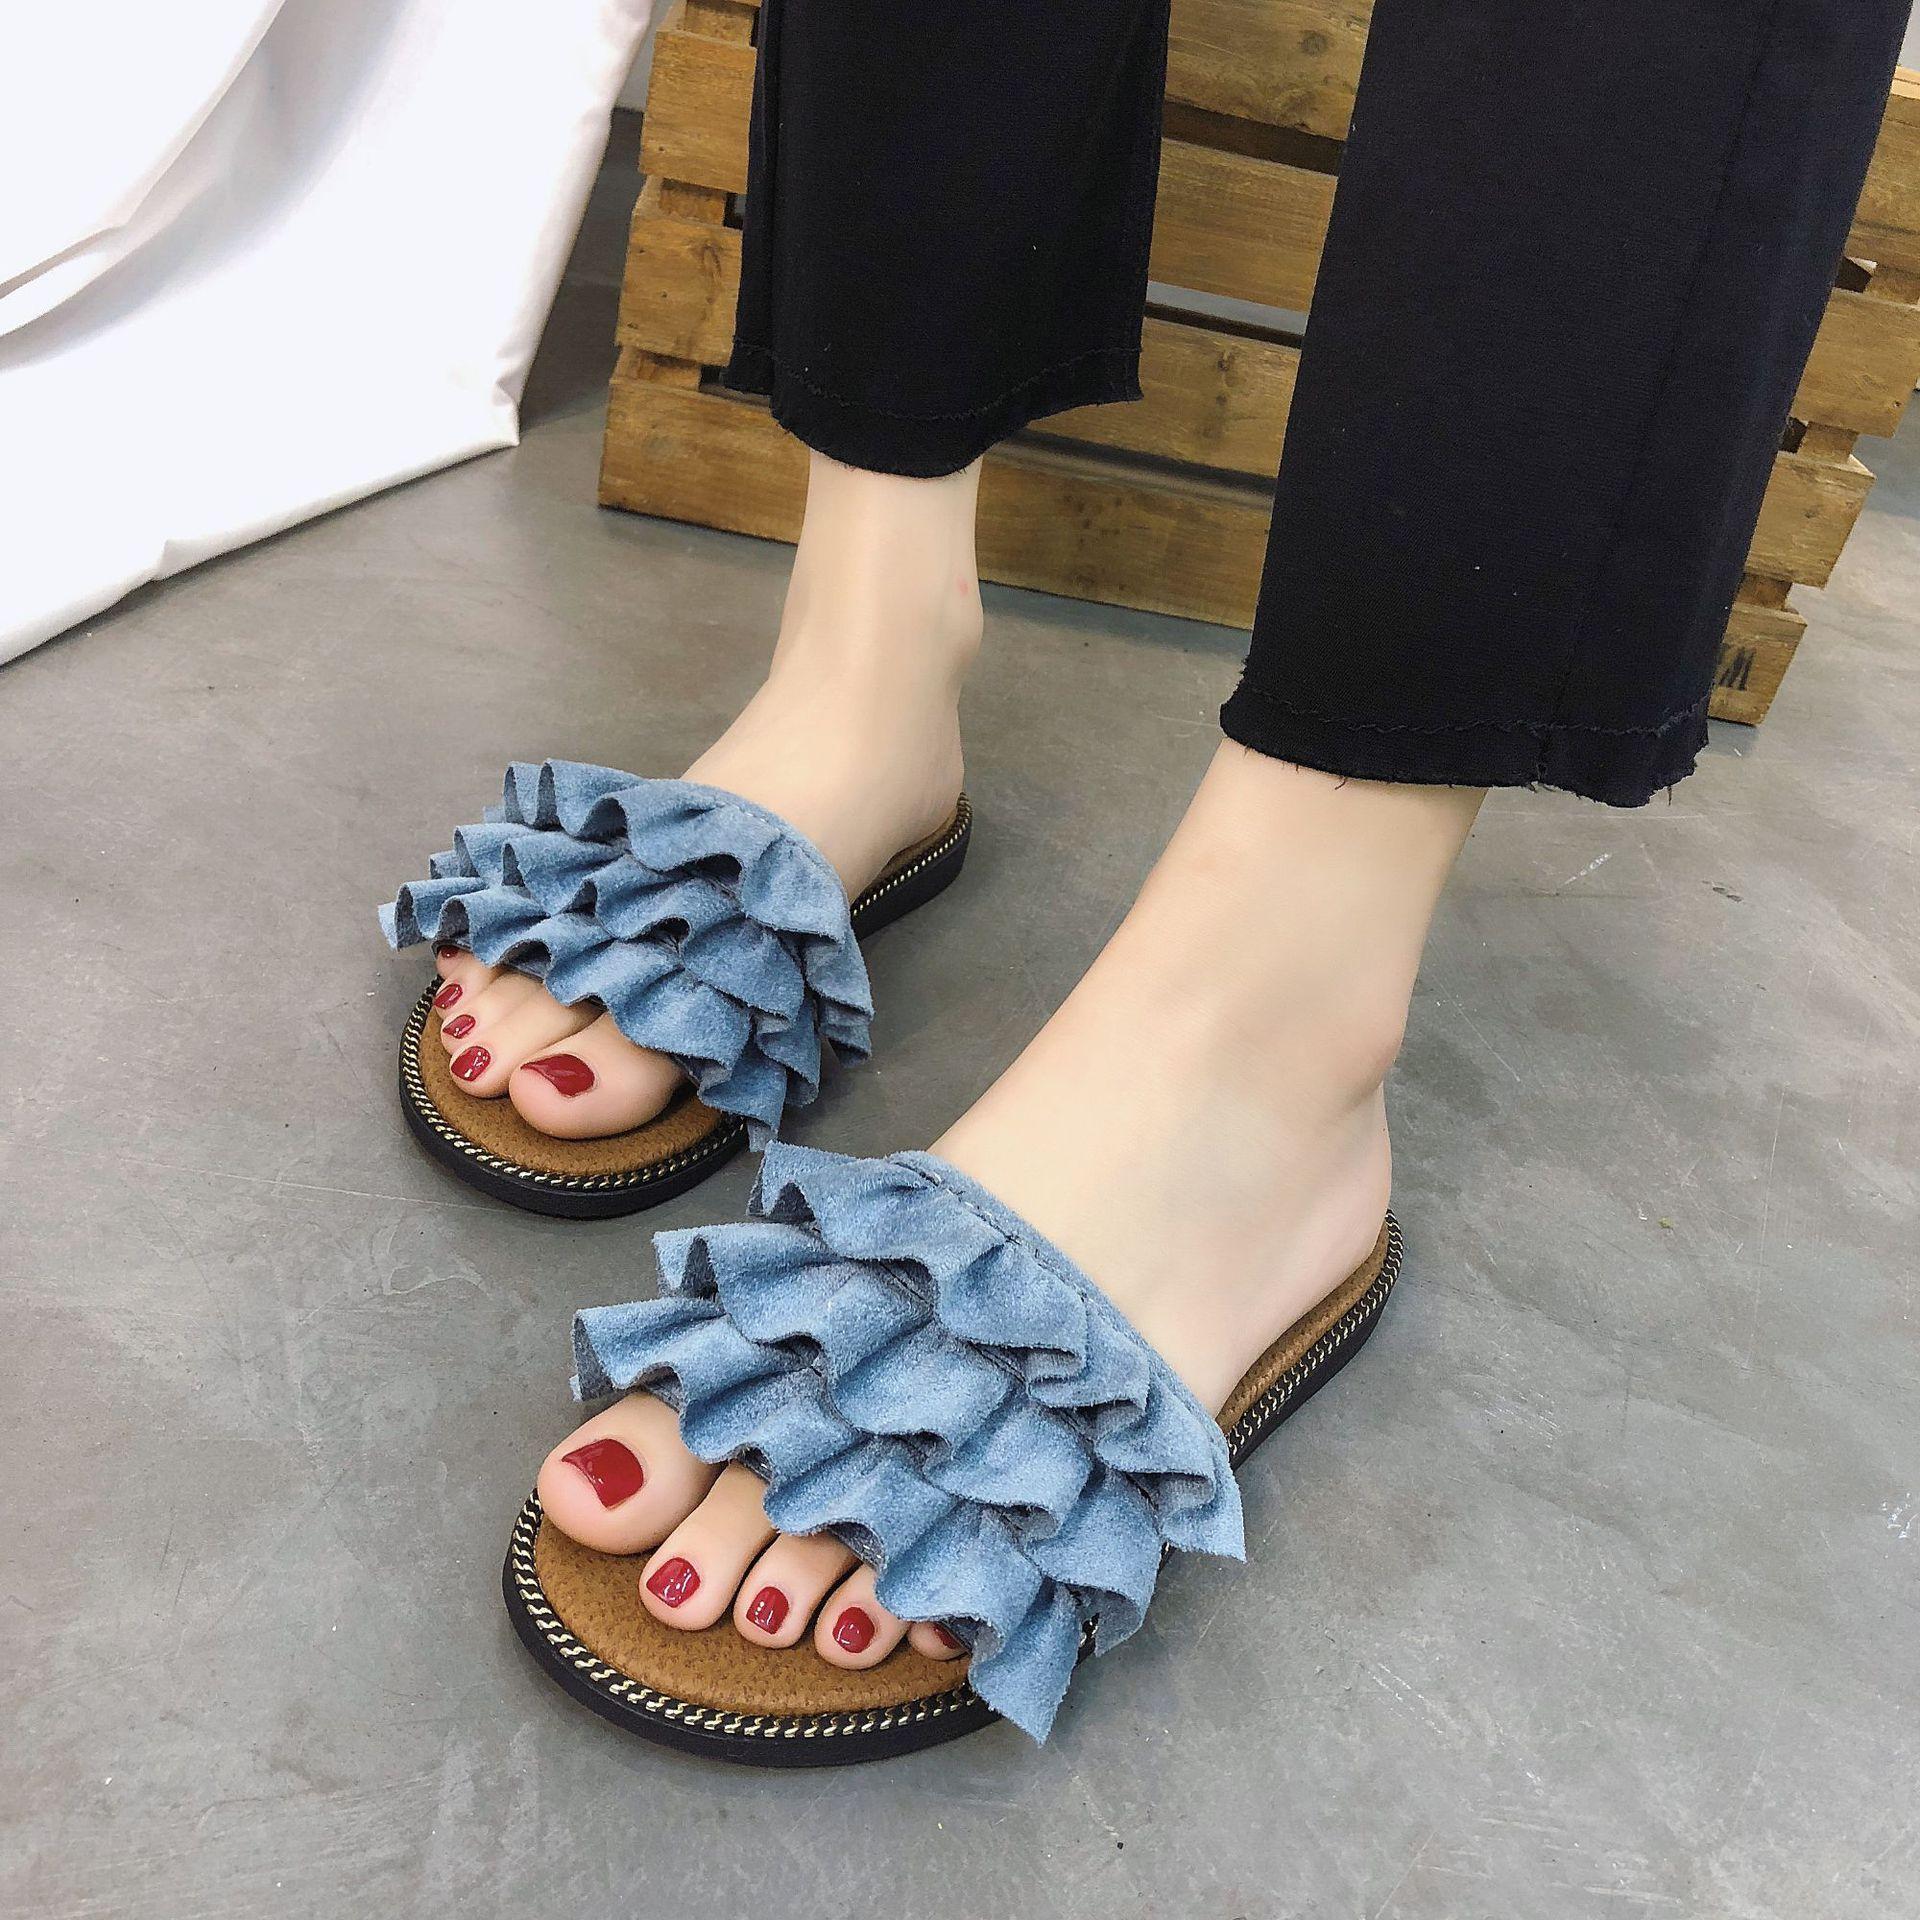 2019 Women Summer Beach Shoes Ruffles No Fur Slippers Flat Heels Flip Flops Ladies Bohemian Sandals Fold Platform Cotton Shoes in Slippers from Shoes